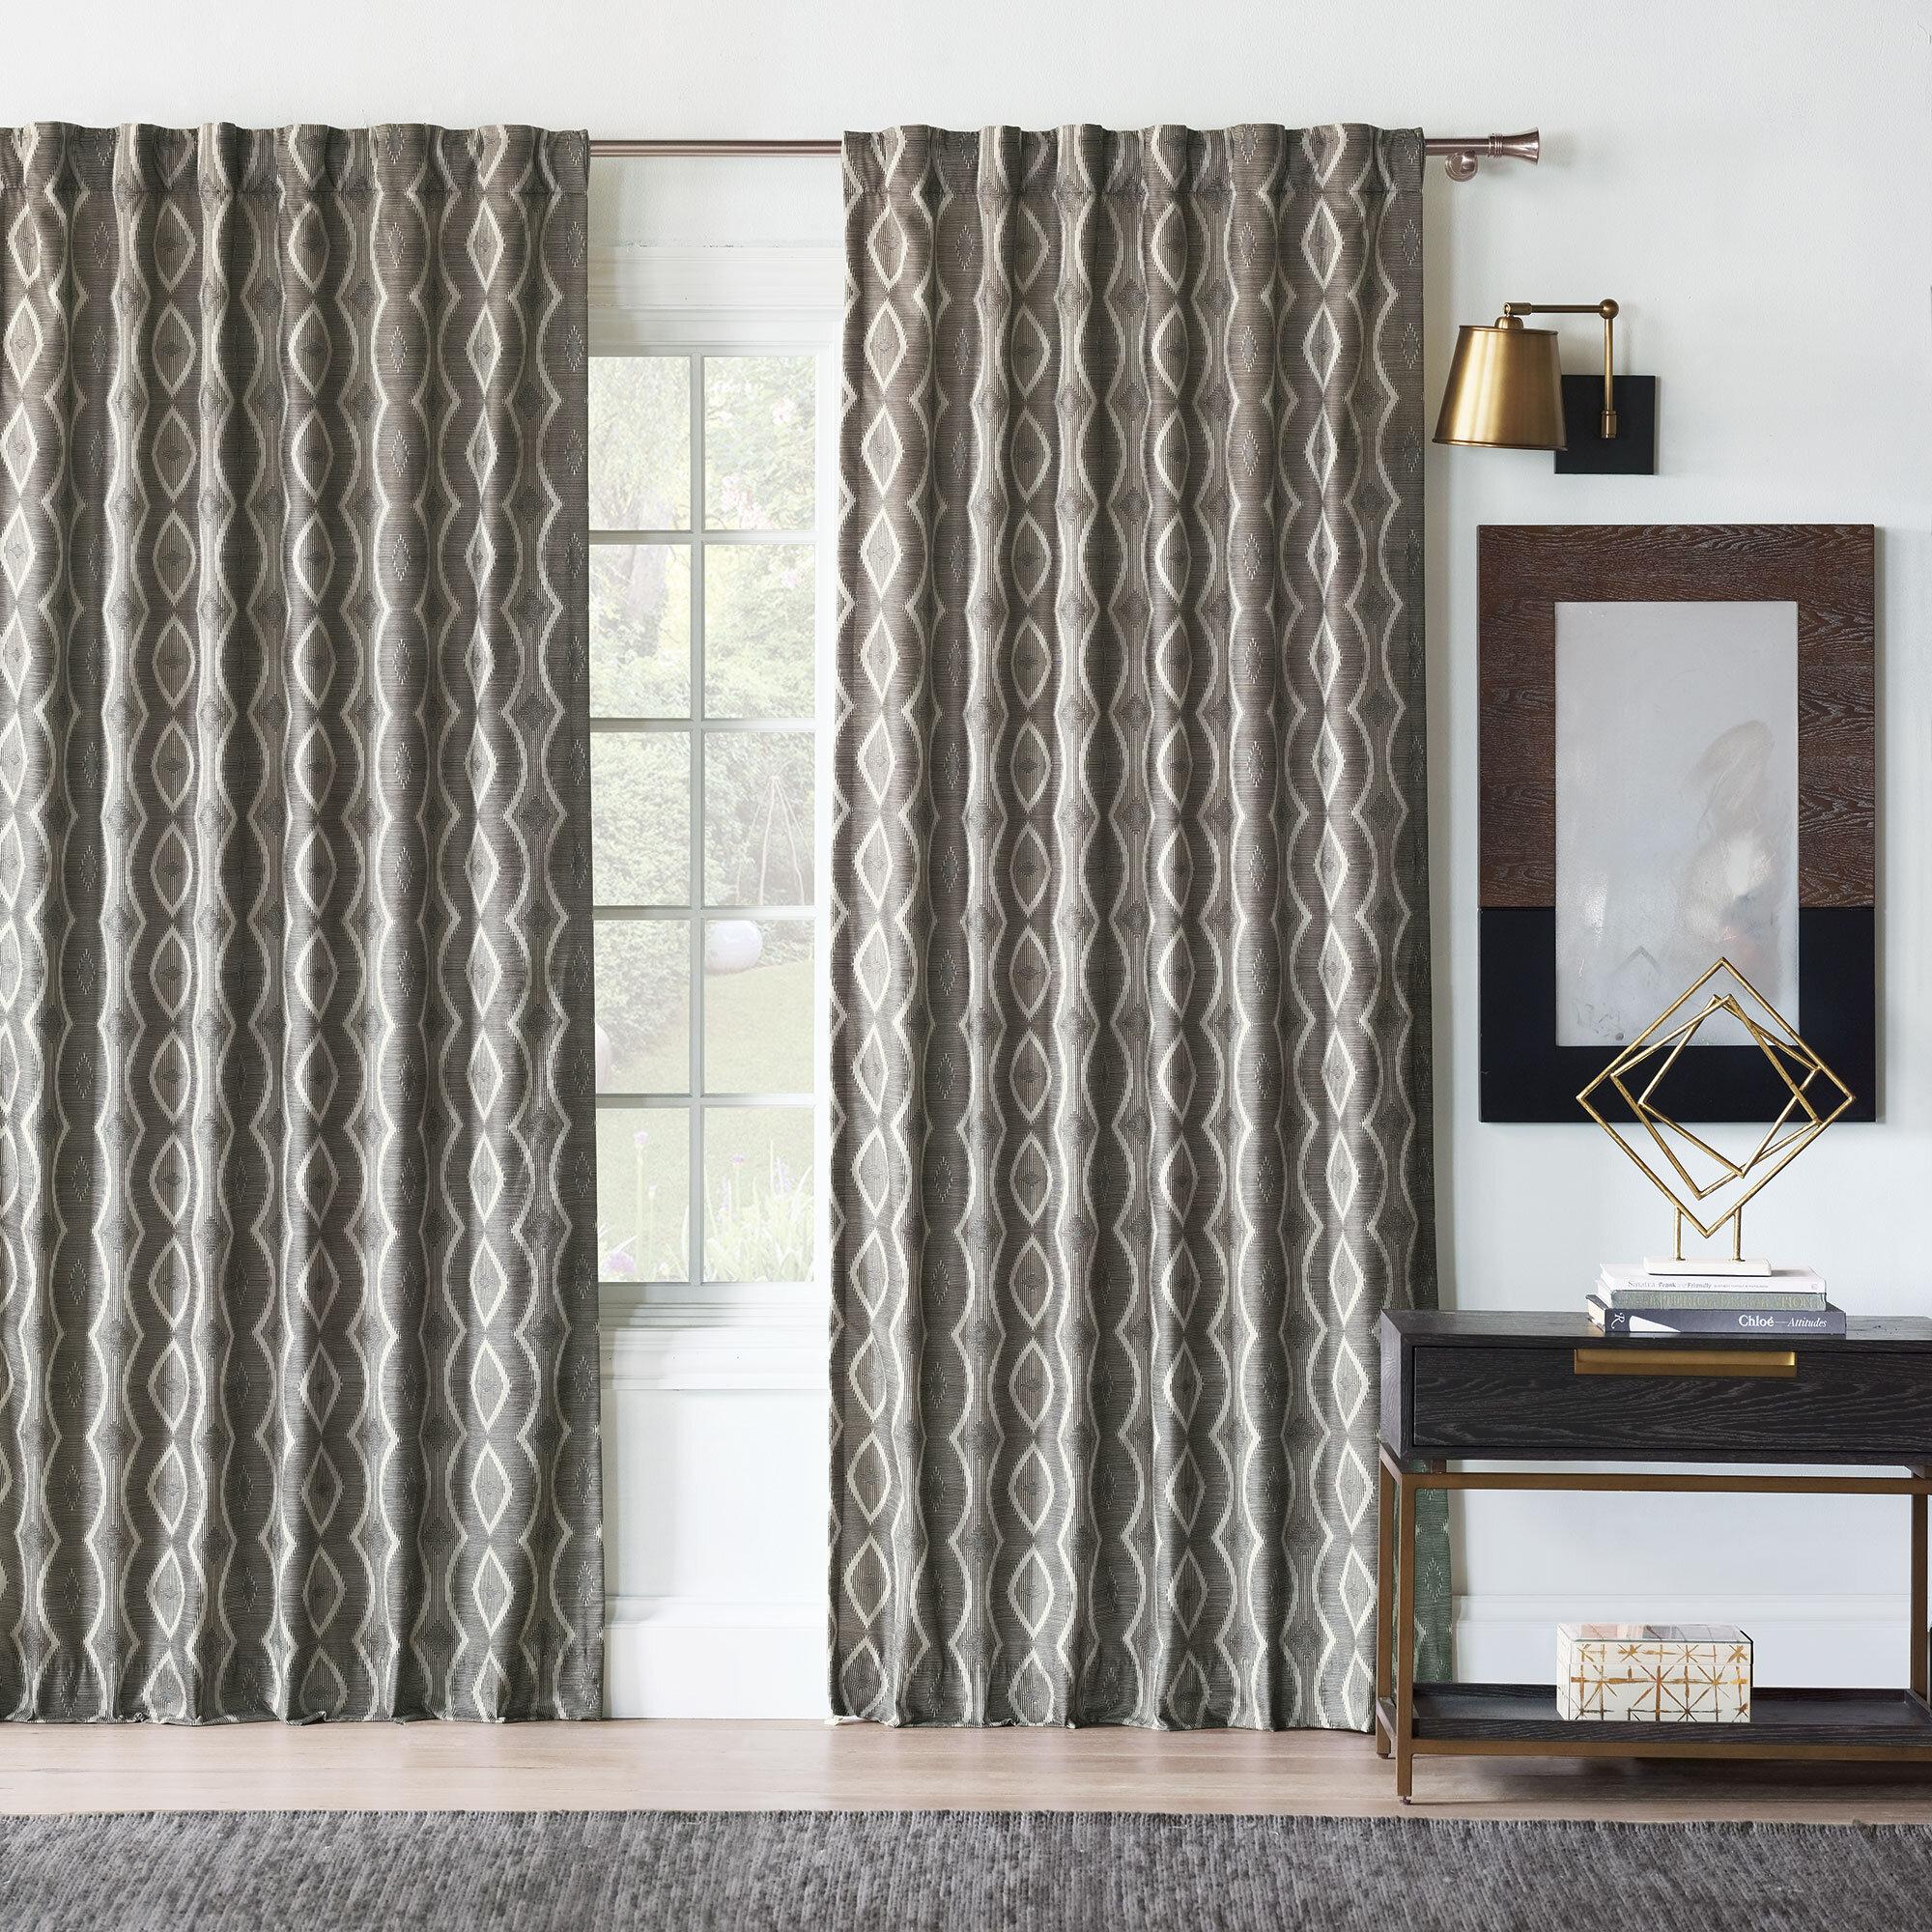 Eastern Accents Idris 100 Cotton Geometric Room Darkening Rod Pocket Single Curtain Panel Perigold